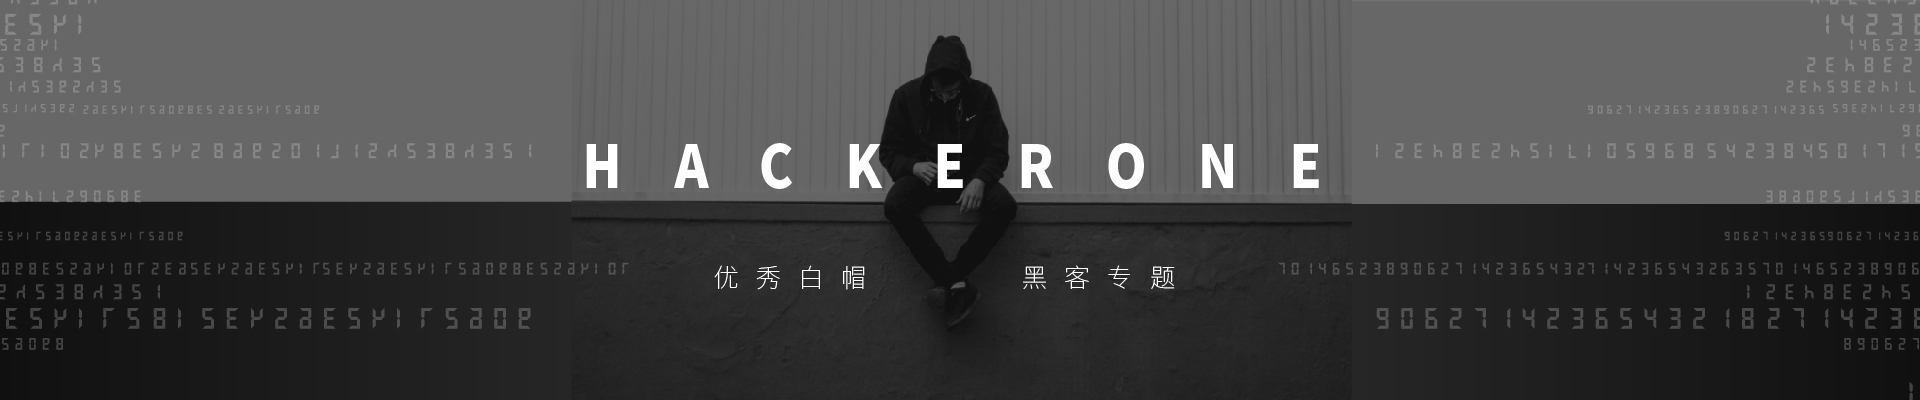 Hackerone优秀白帽黑客专题